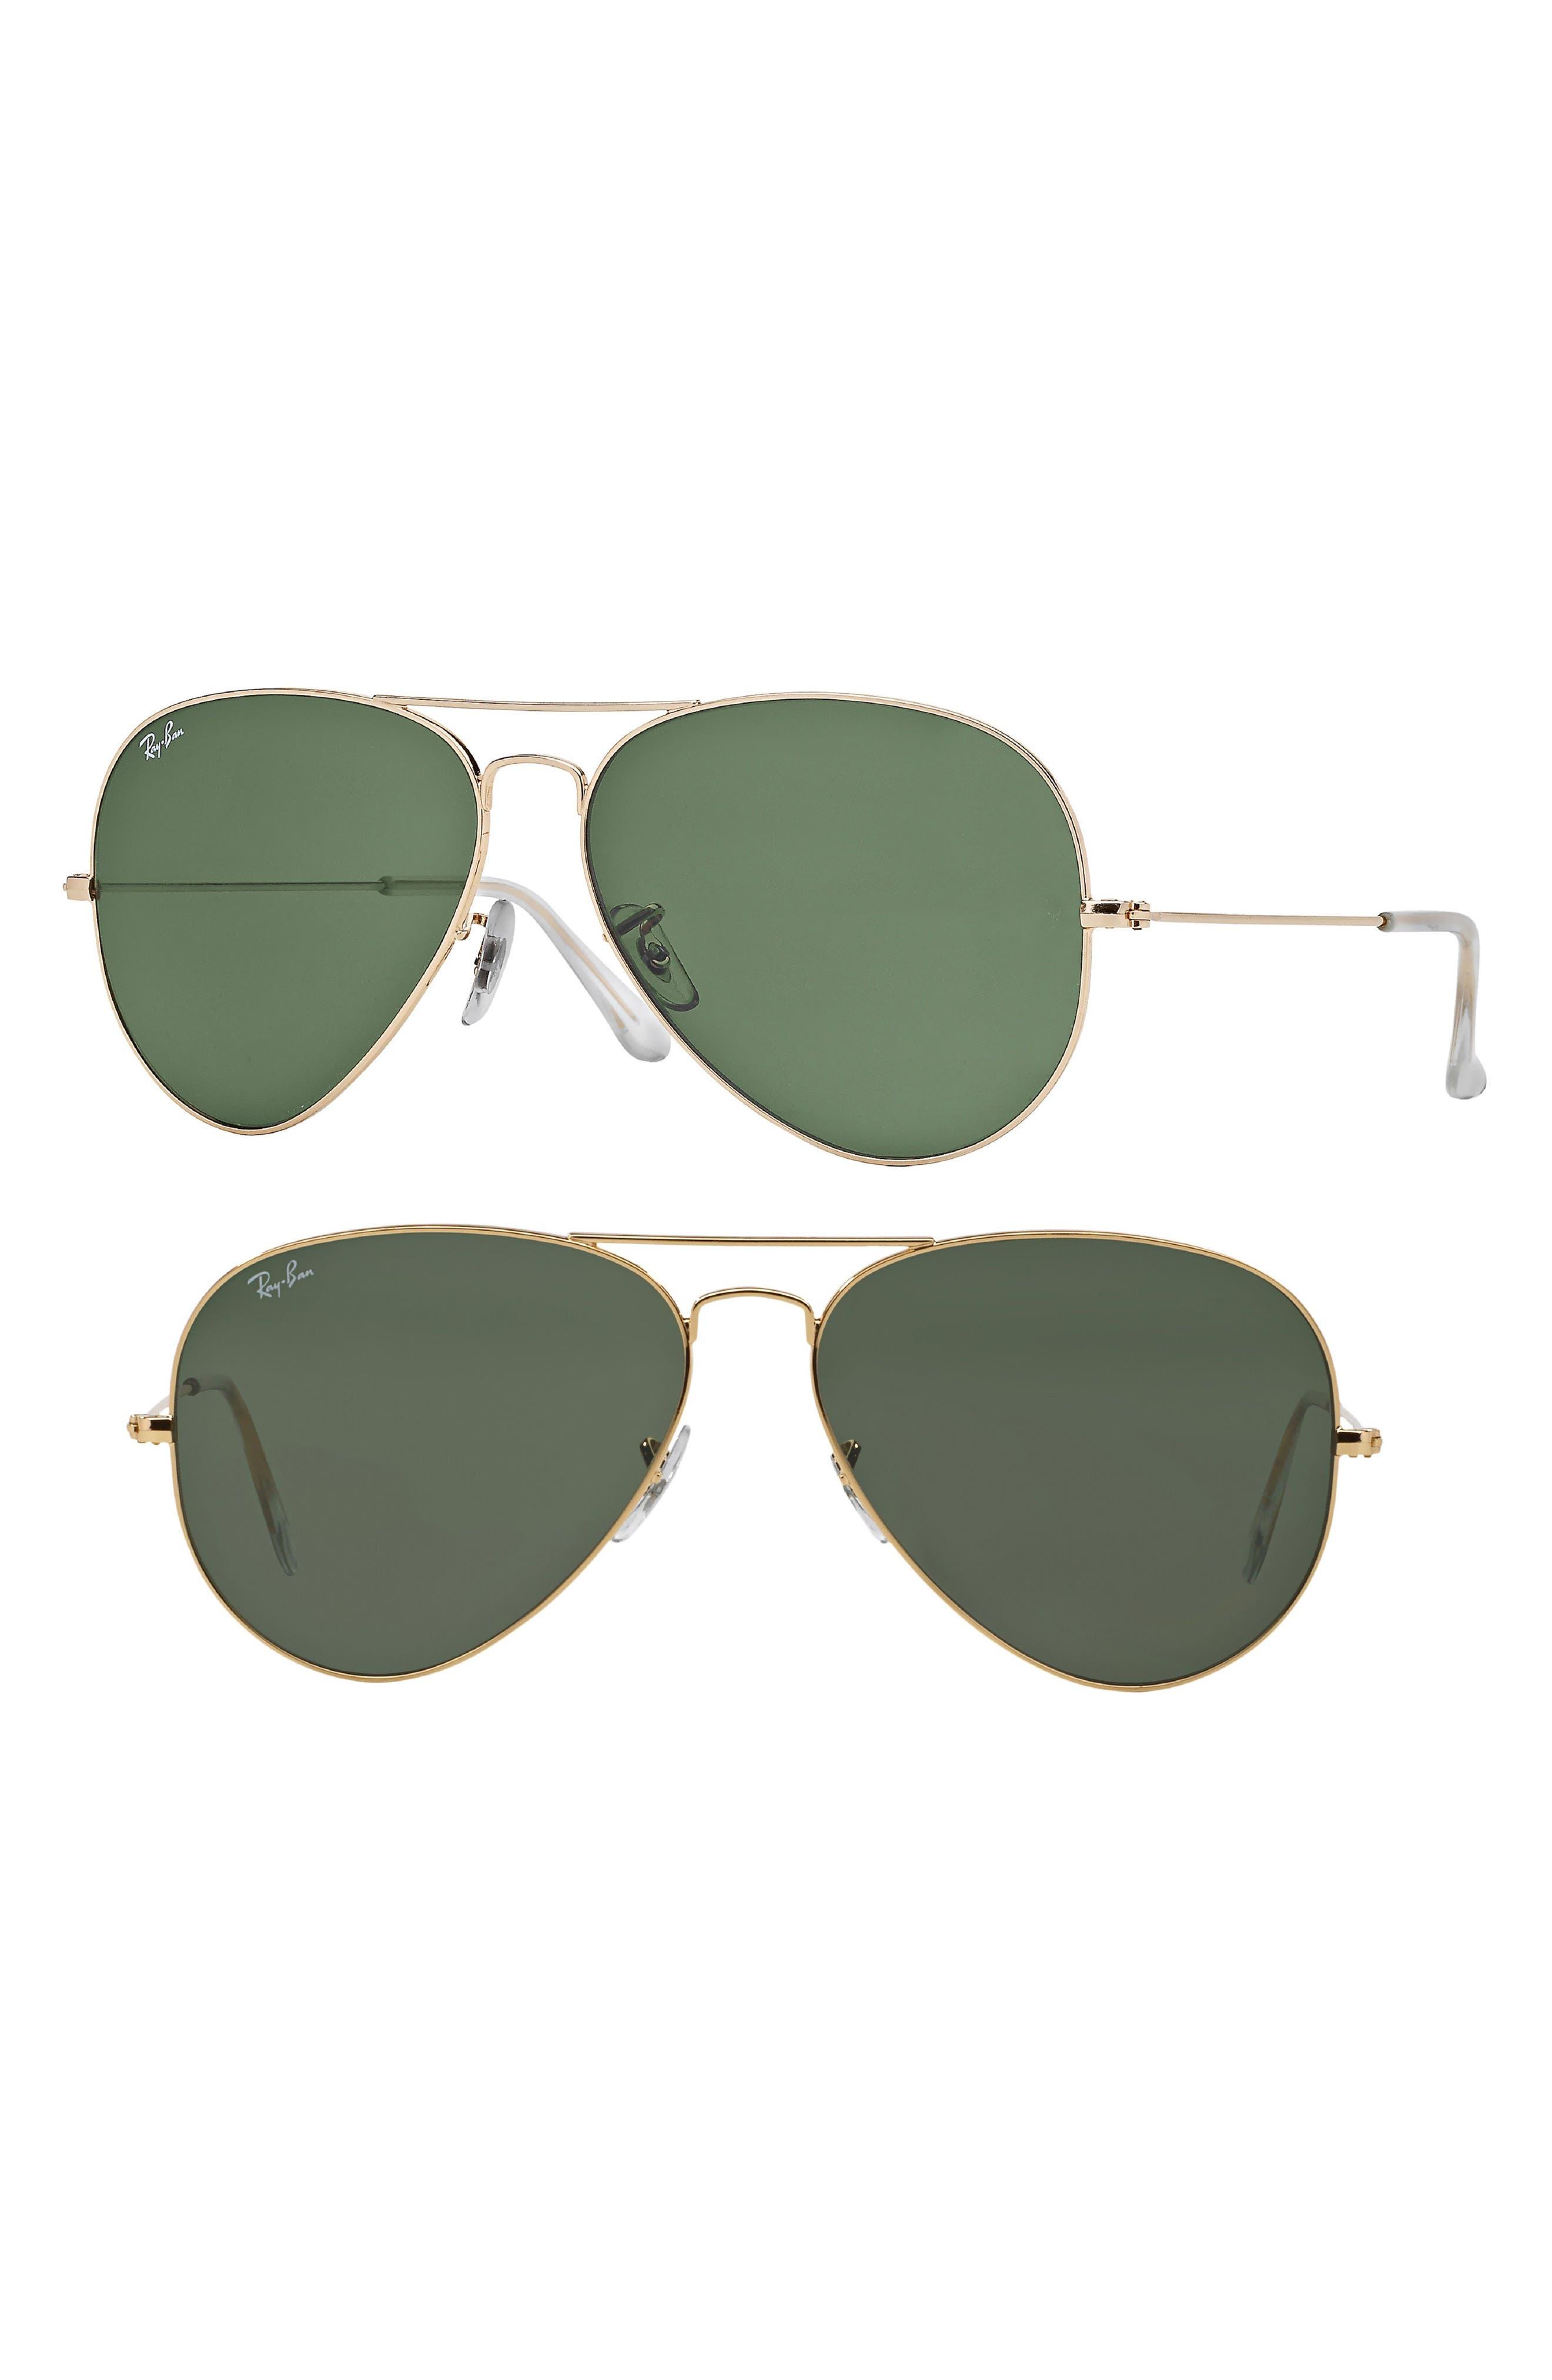 Ray-Ban Large Original 62Mm Aviator Sunglasses - Gold/ Green